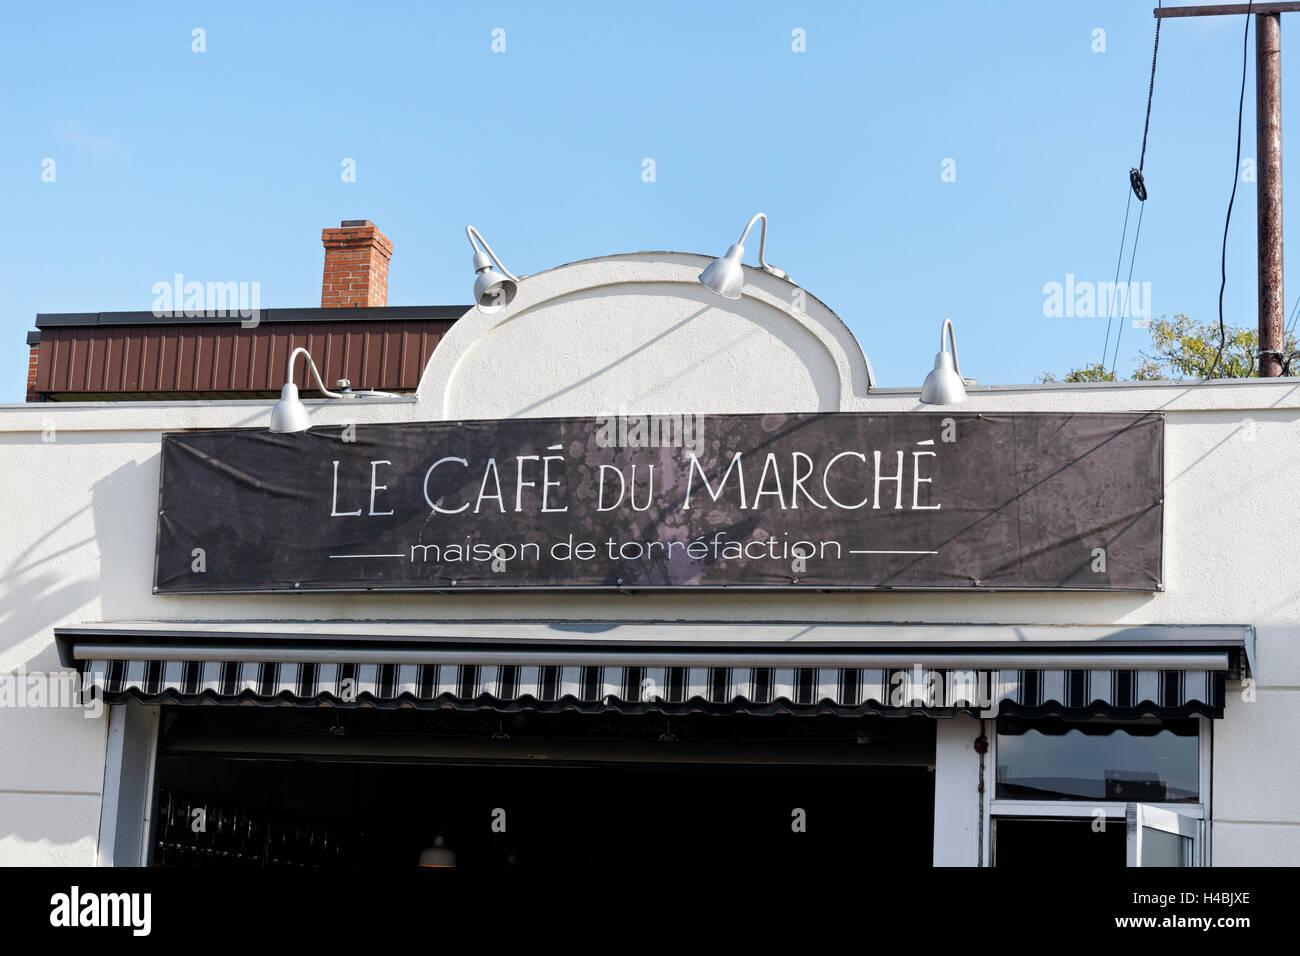 The Cafe de la Marche next to the Jean Talon Market, Montreal, Quebec, Canada - Stock Image